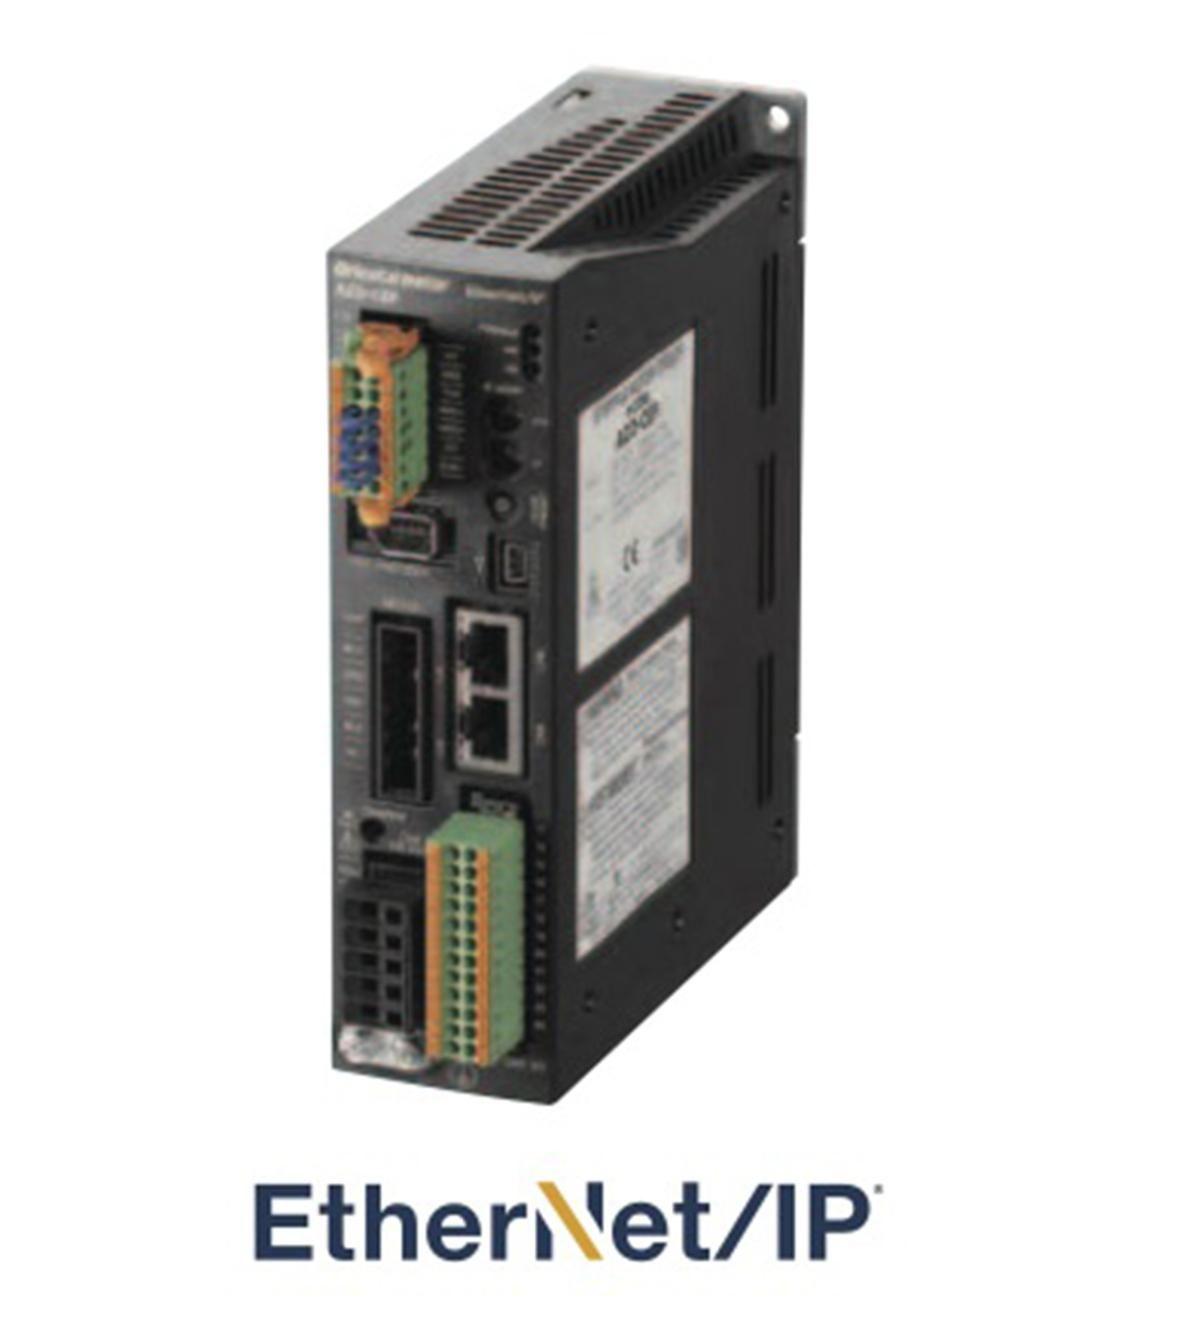 New Ethernet IP driver communications for Oriental Motor's AZ Series of Closed Loop Stepper Motors